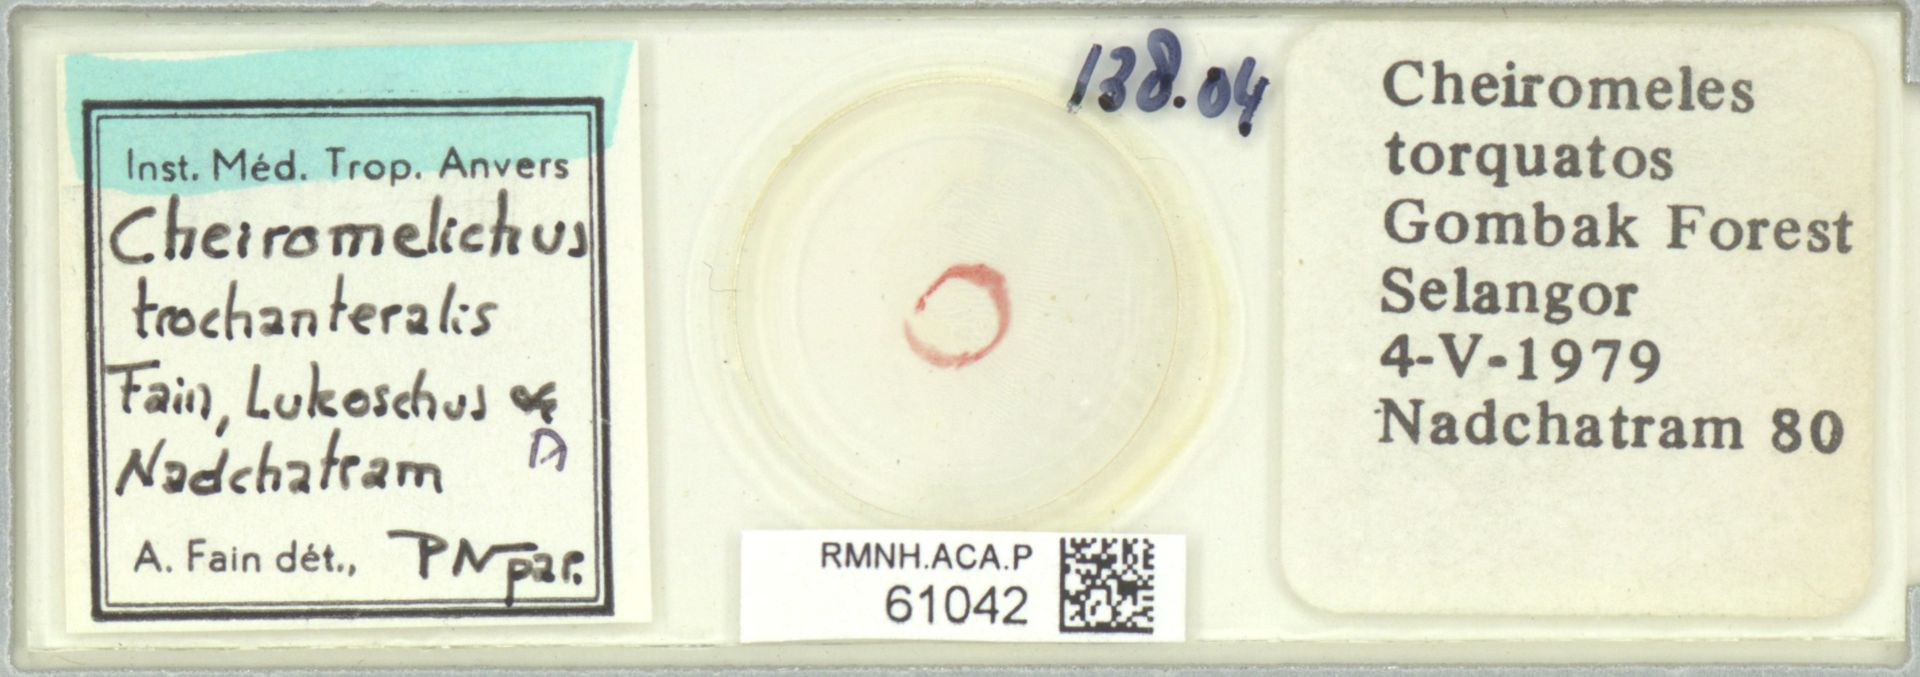 RMNH.ACA.P.61042 | Cheiromelichus trochanteralis Fain, Lukoschus & Nadchatram